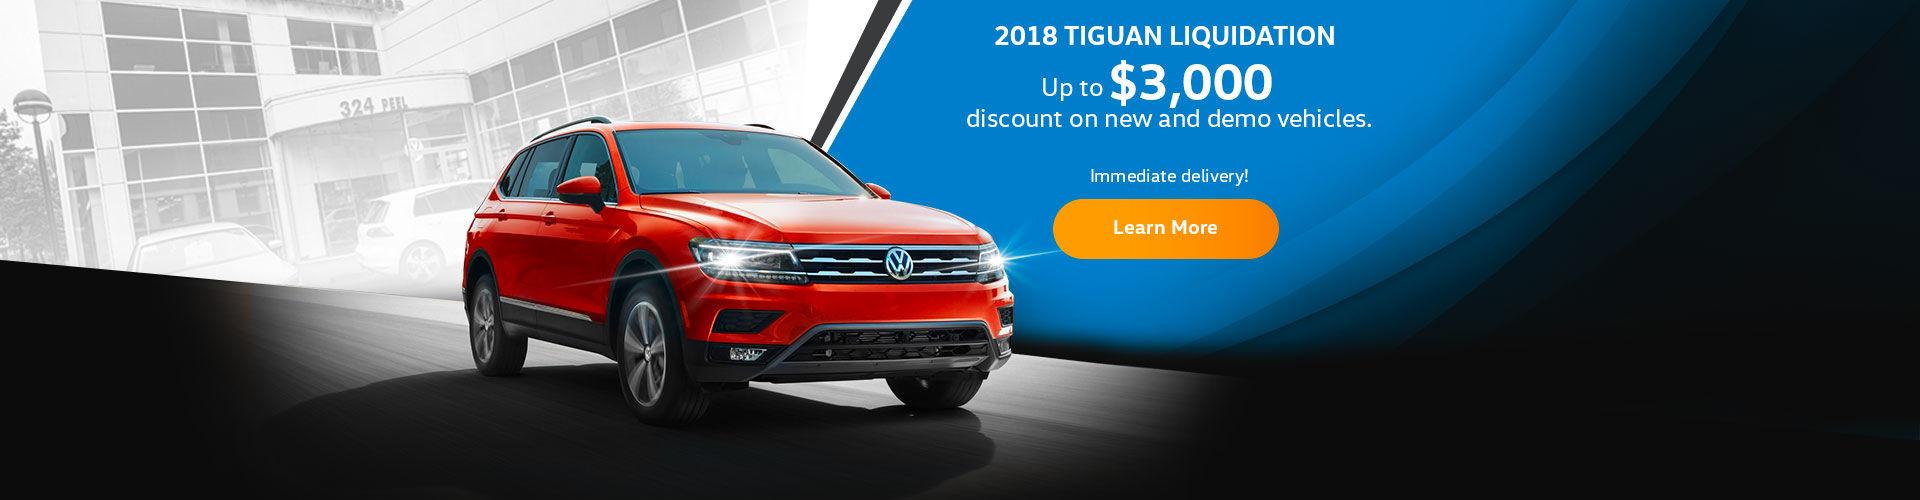 2018 Tiguan - $3,000